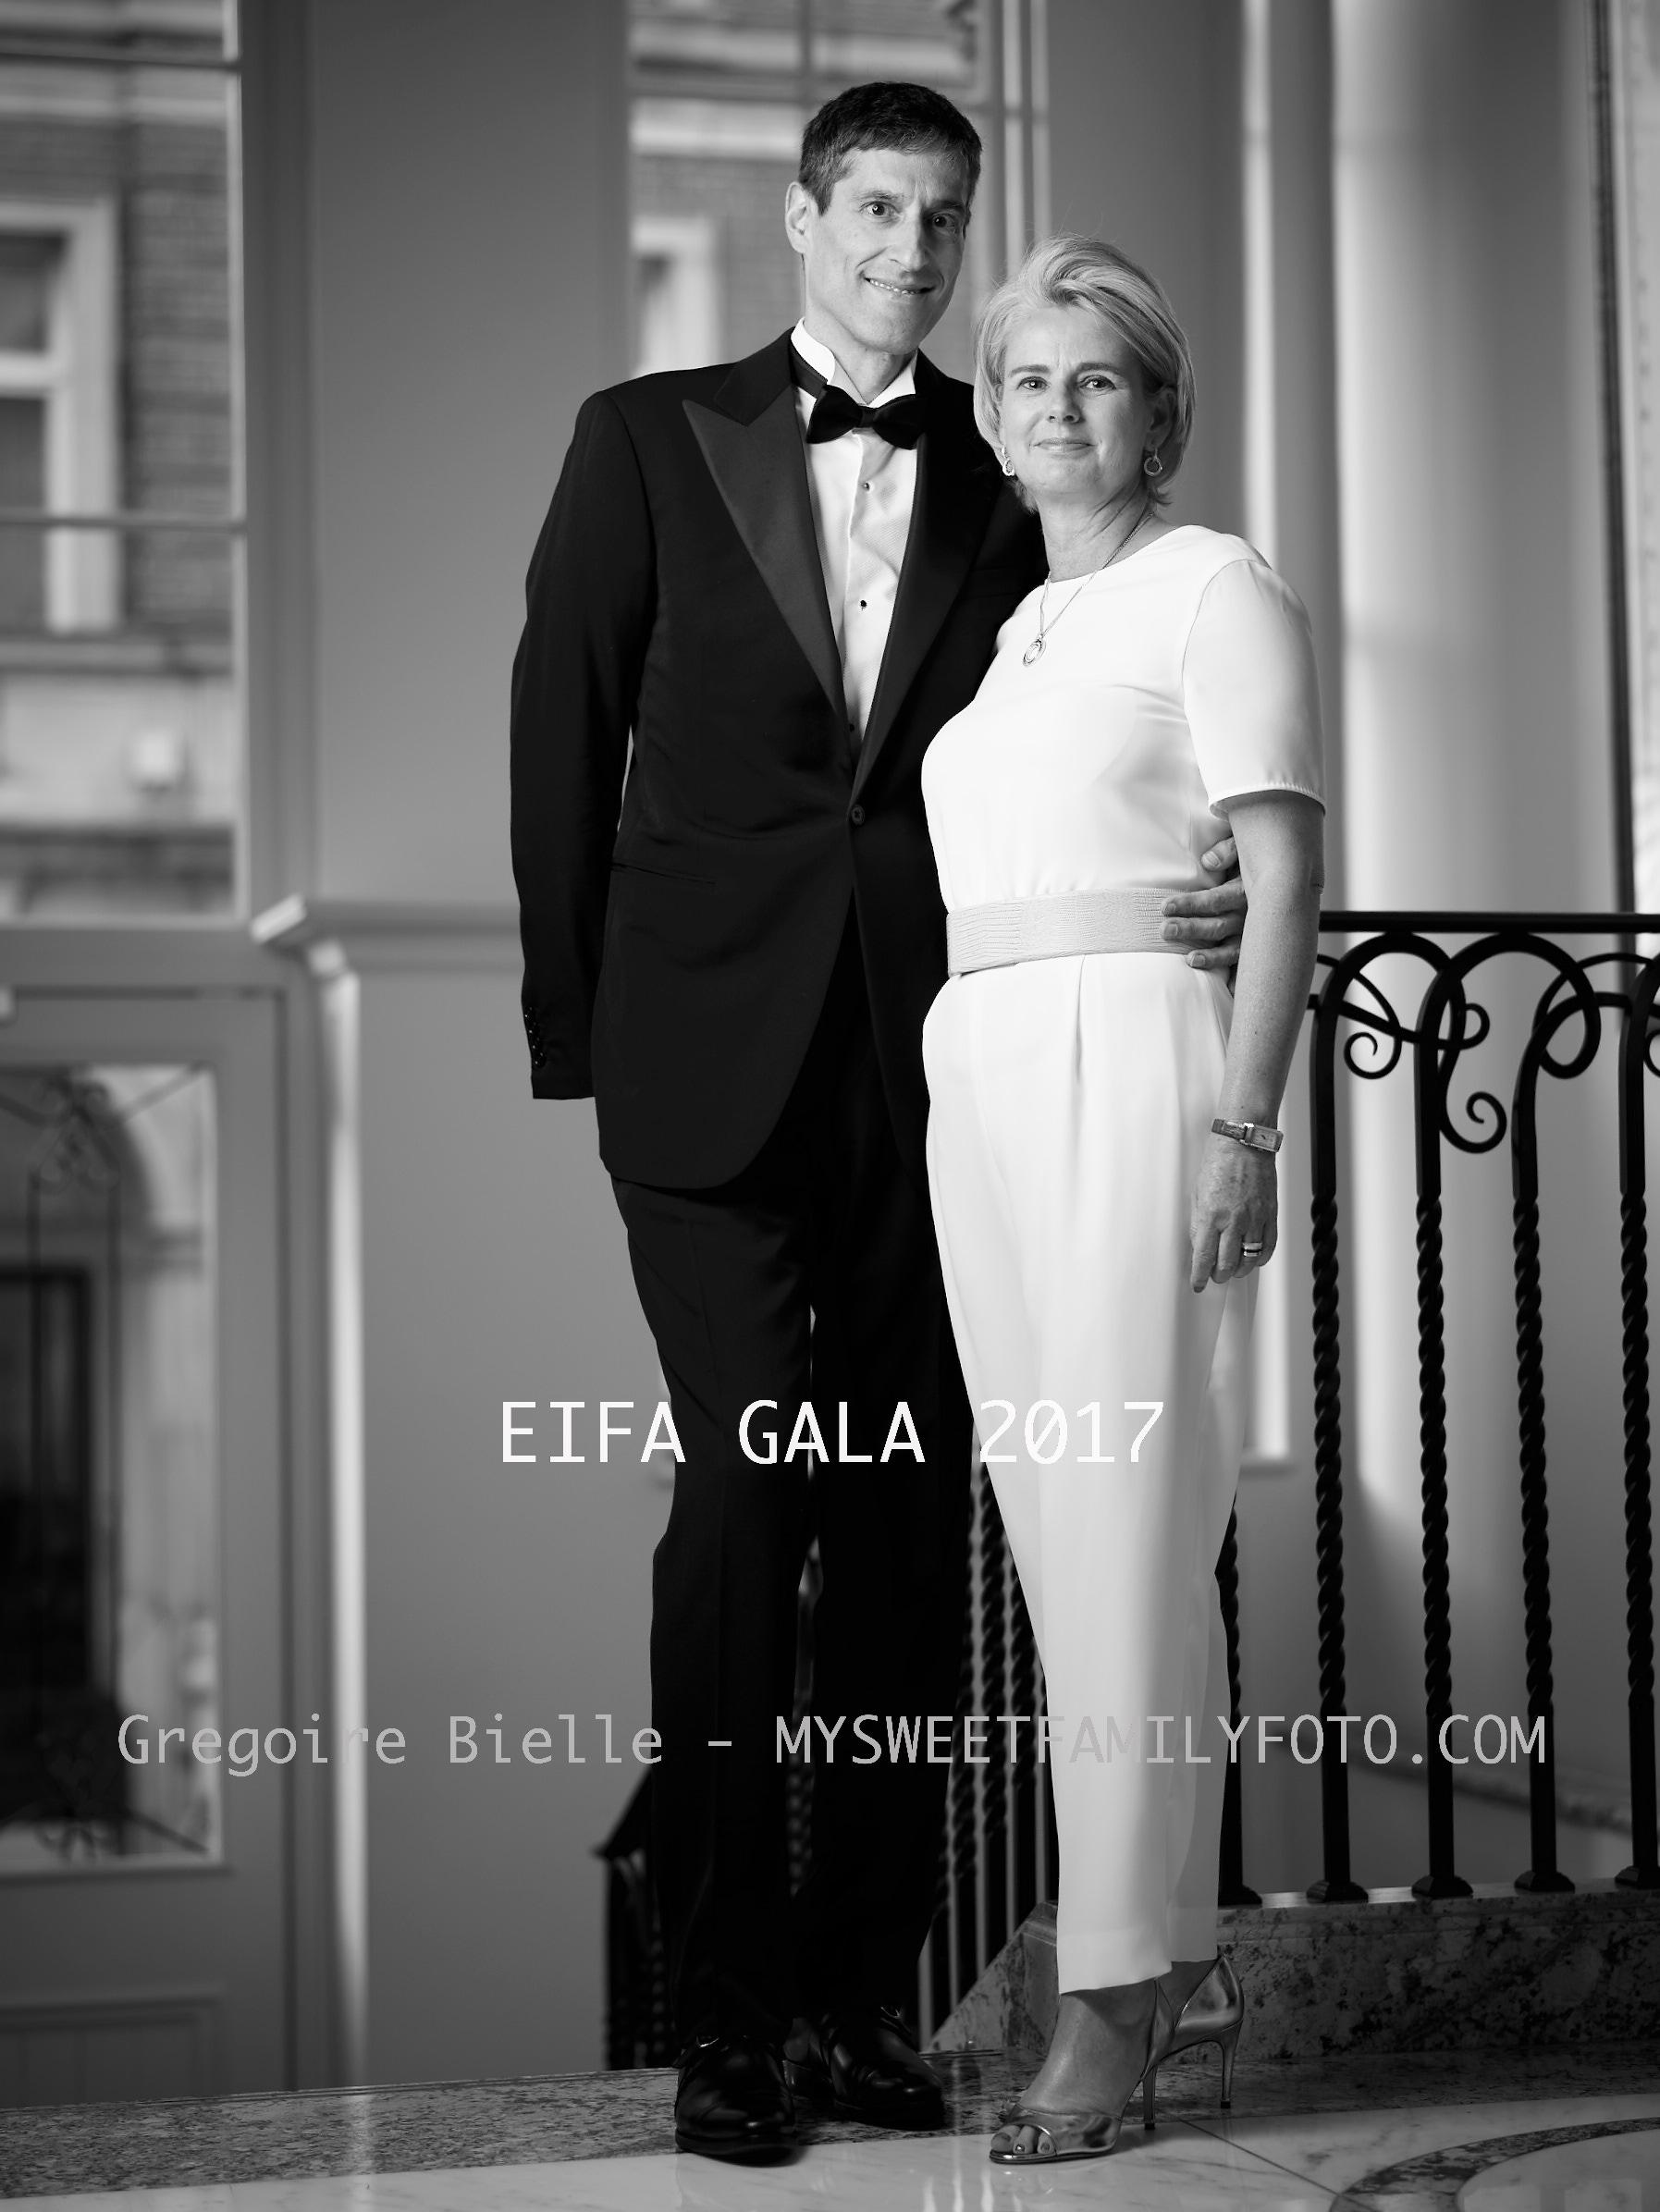 EIFA GALA 1062.jpg